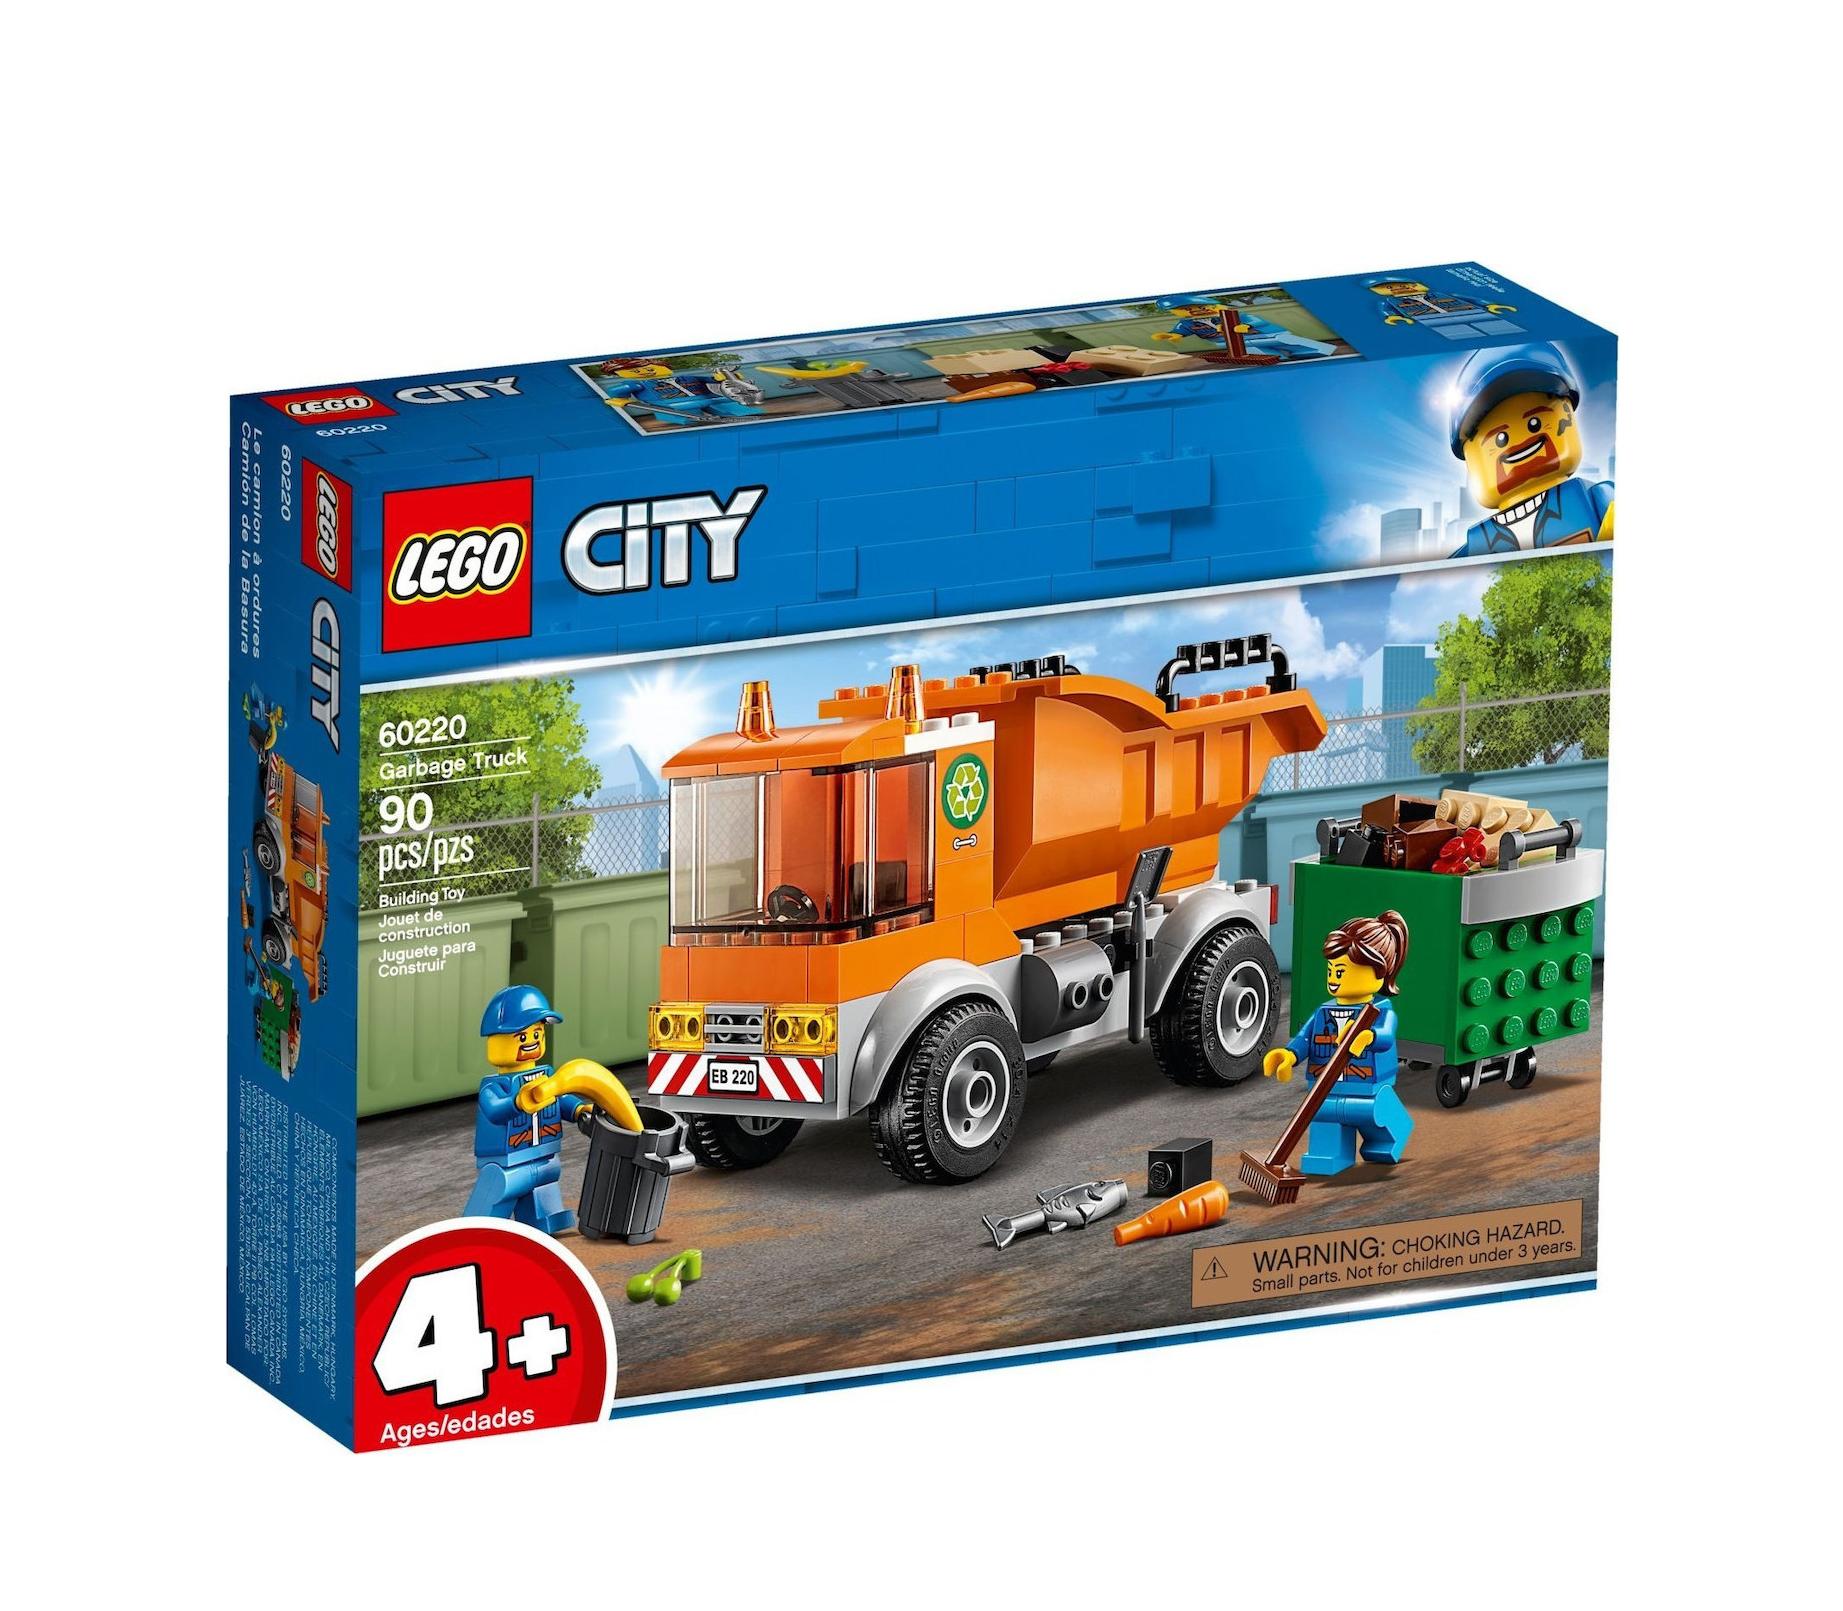 Lego City: Garbage Truck 60220